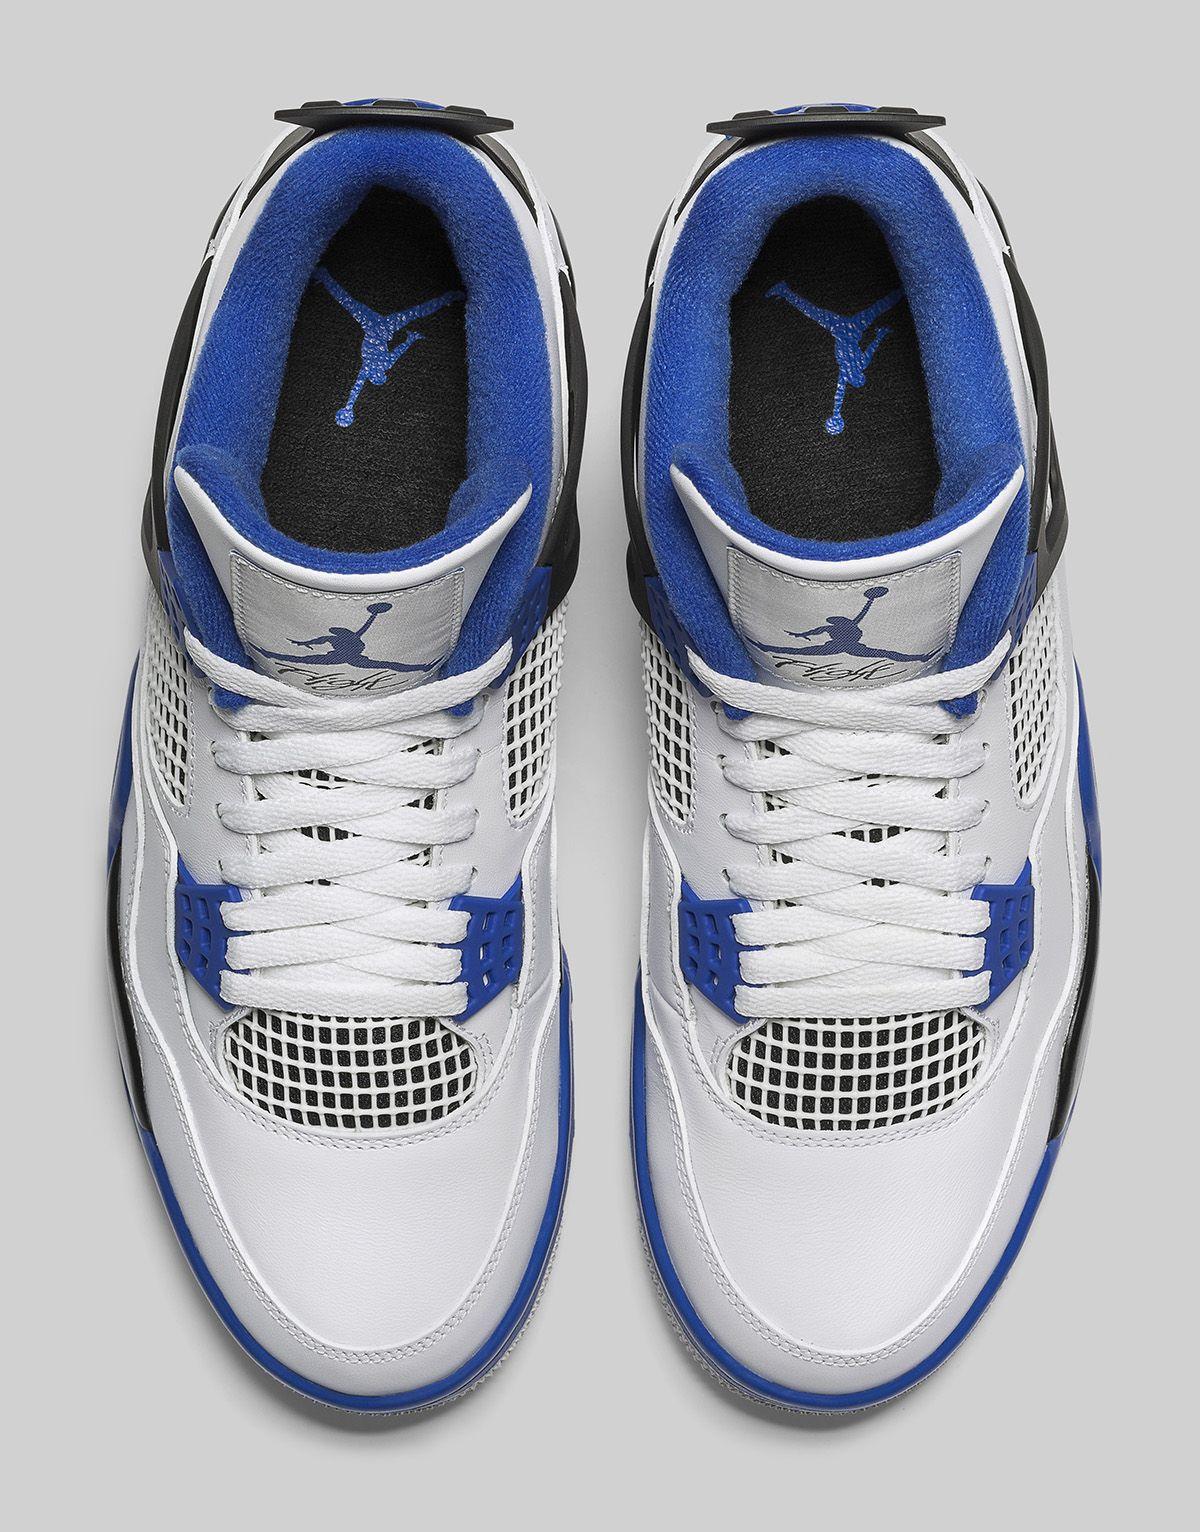 promo code 3bd7c f017a Release Date  Air Jordan 4 Retro Motorsports - EU Kicks  Sneaker Magazine